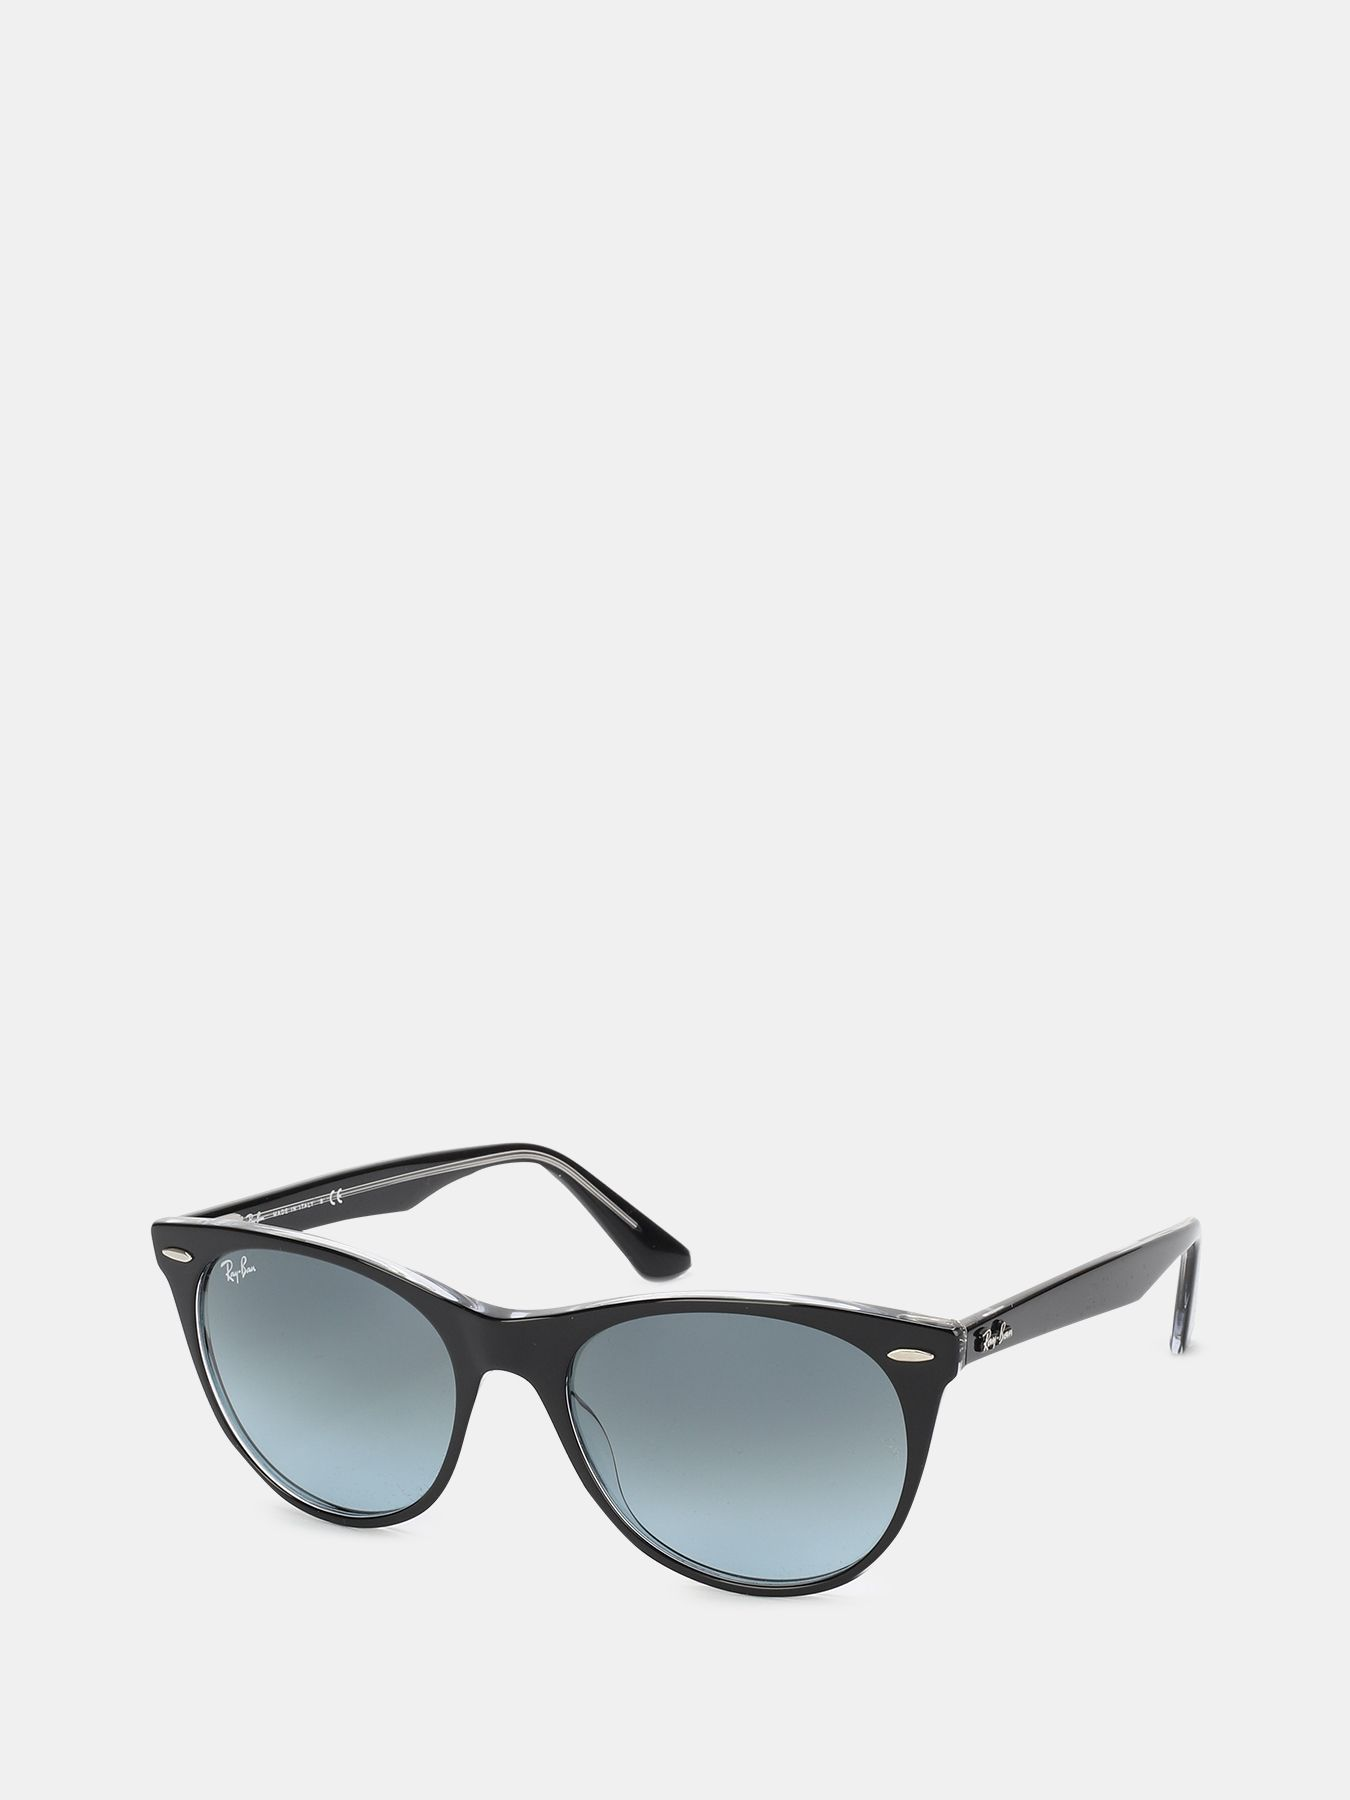 Очки Ray-Ban Солнцезащитные очки gamma ray skeletons